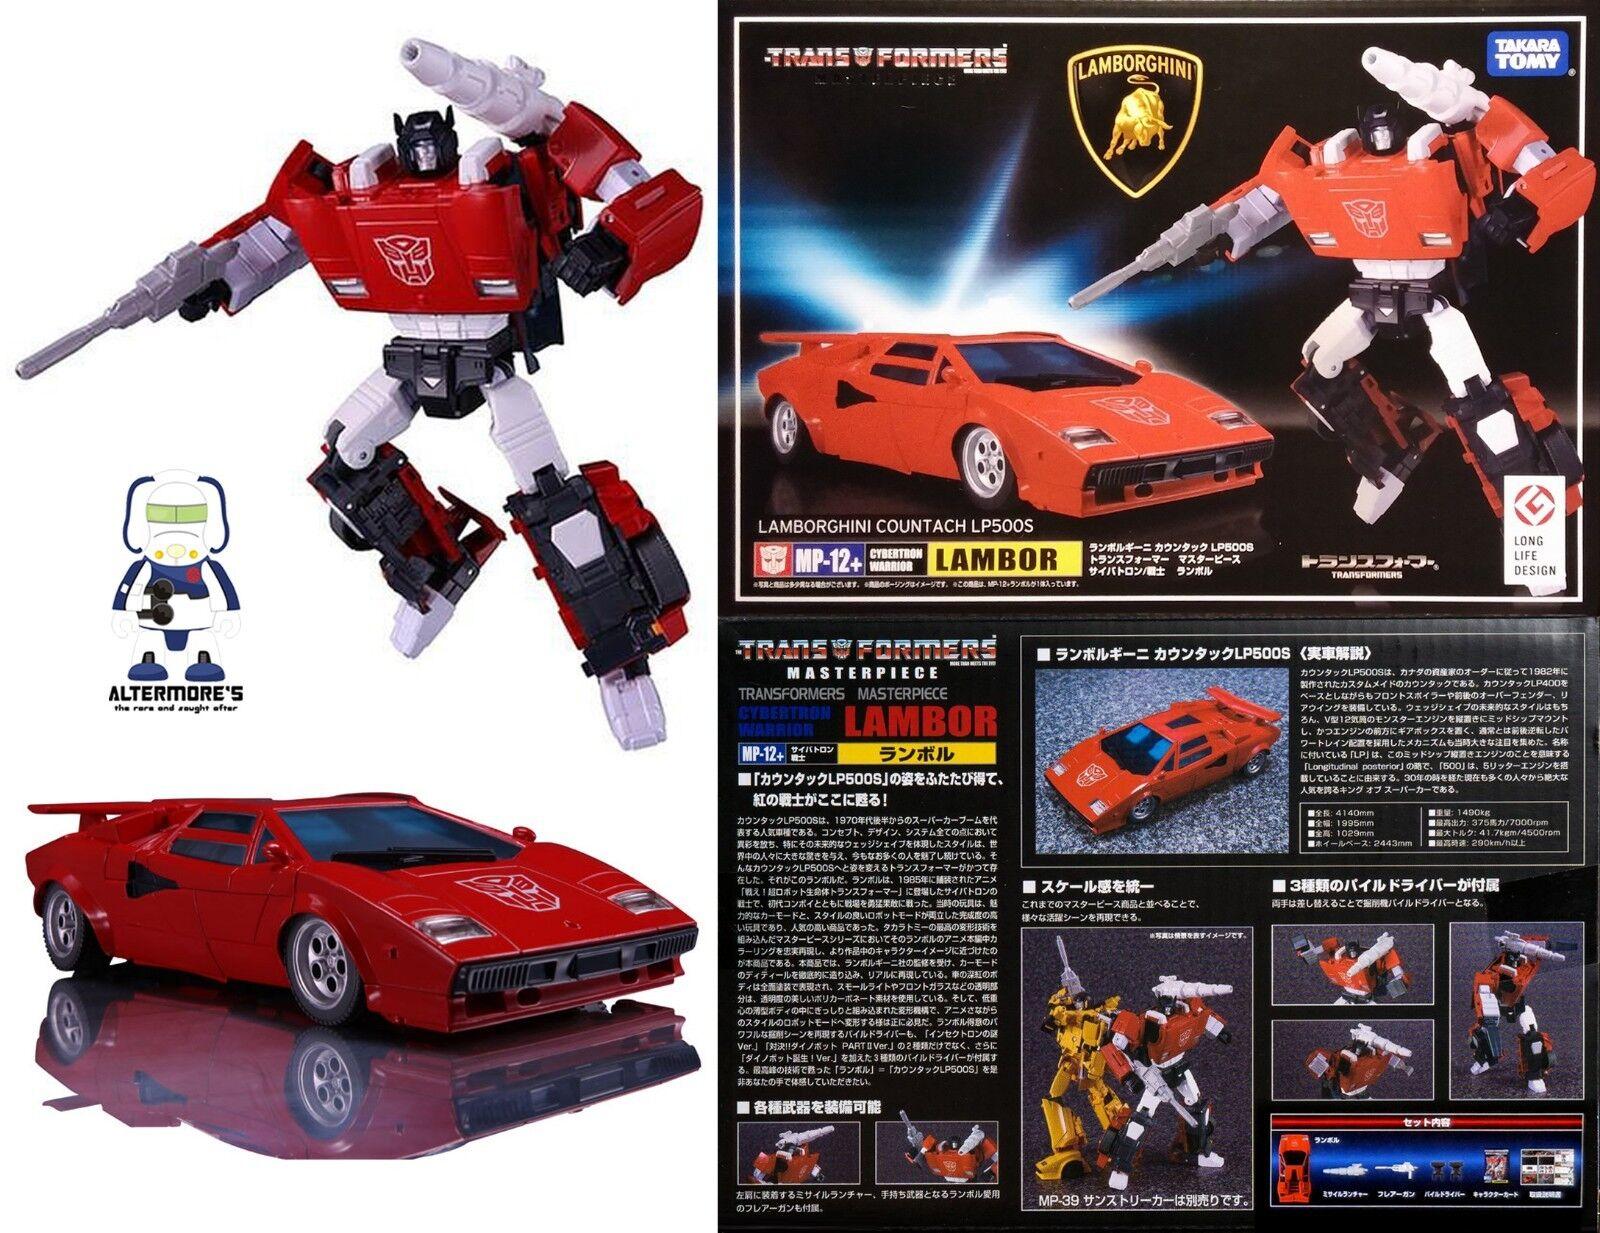 Transformers Takara Masterpiece MP-12+ Lambor   Sideswipe anime ver MISB